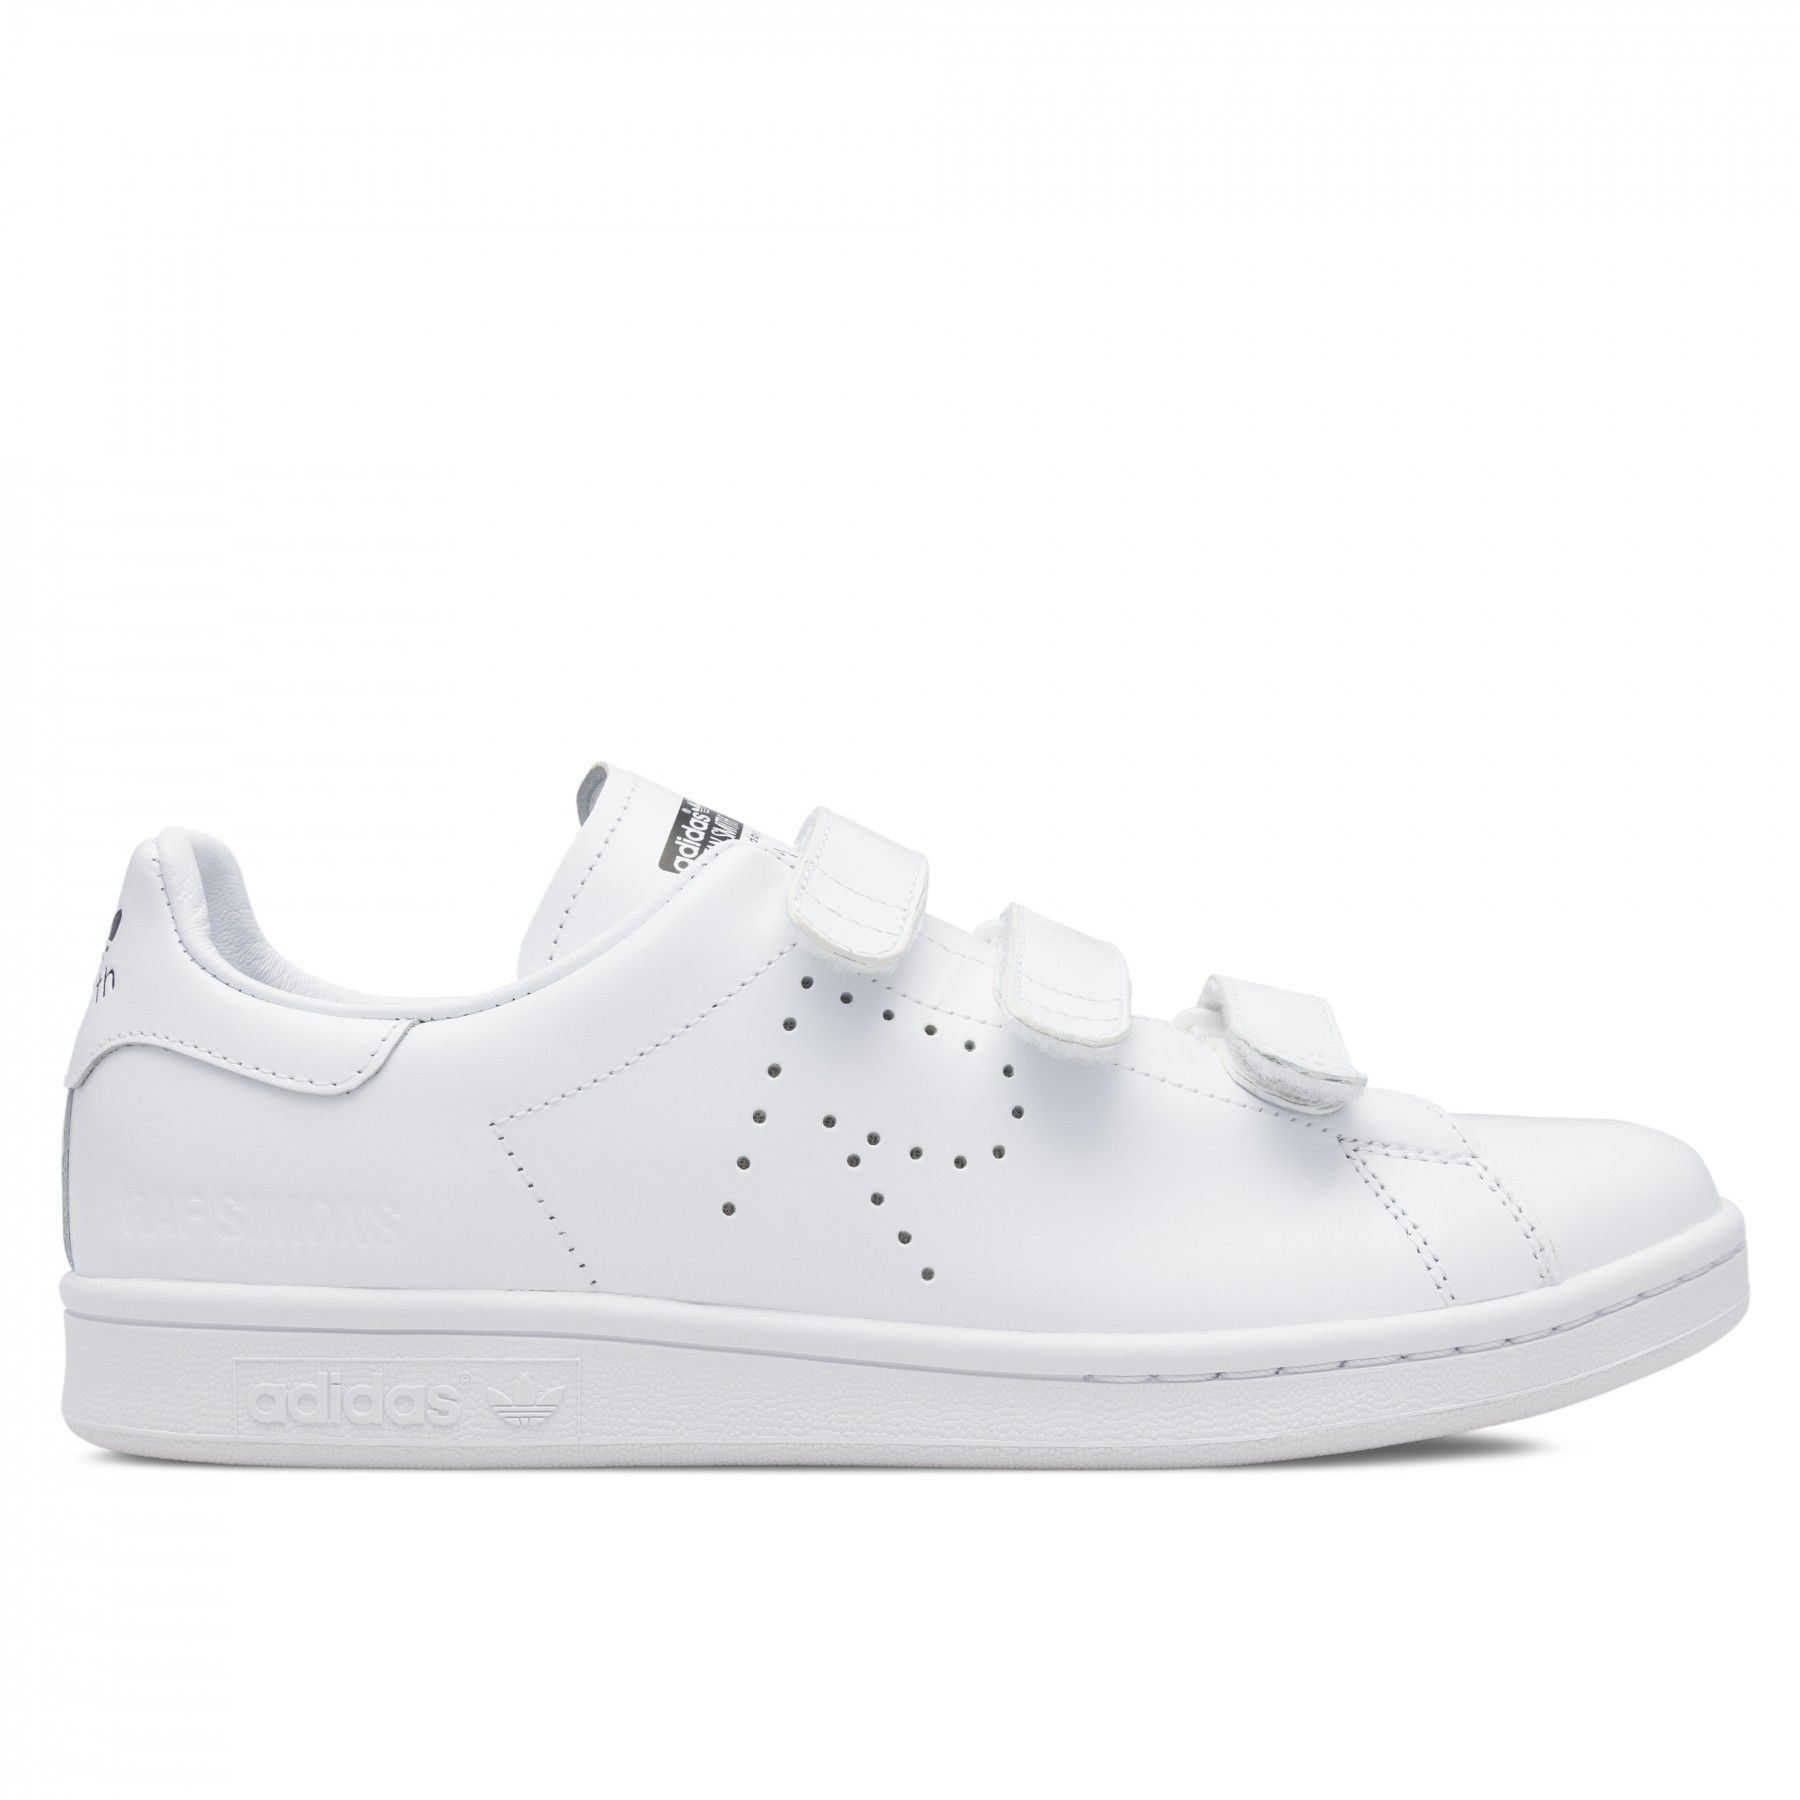 Raf Simons x Adidas Stan Smith Comfort (White)